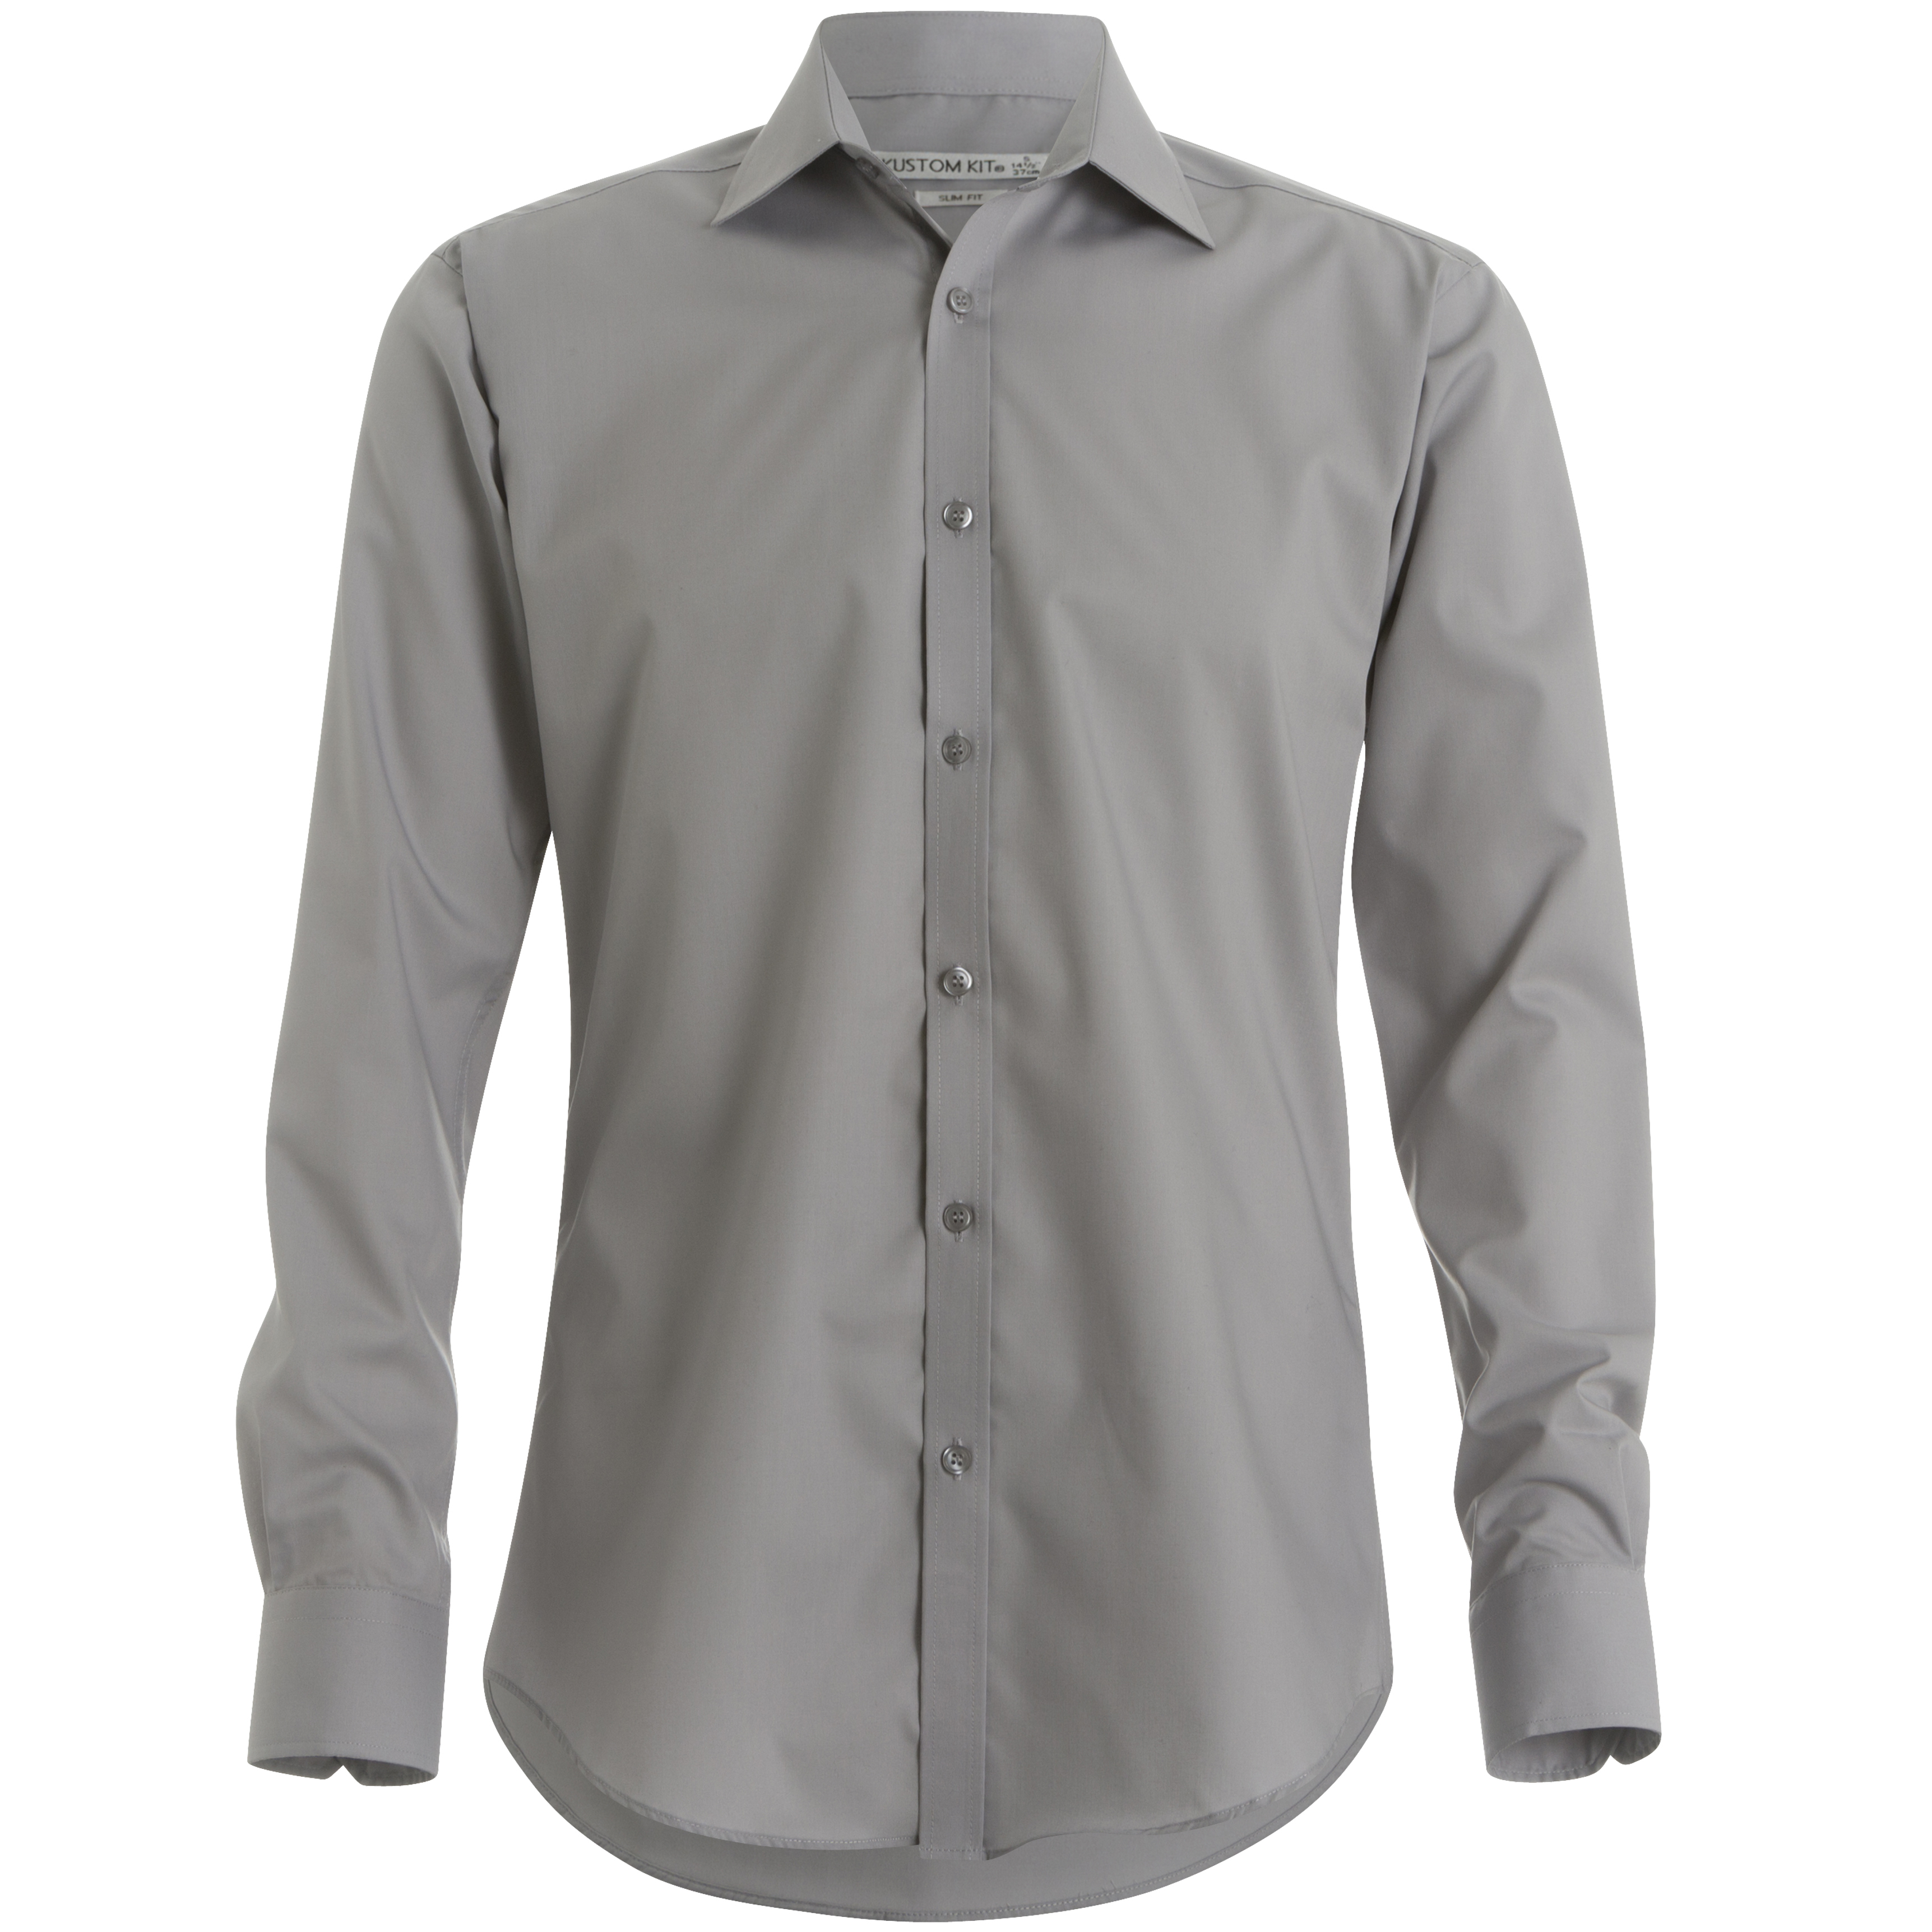 Kustom kit mens slim fit long sleeved collared business for Mens slim fit formal shirts uk